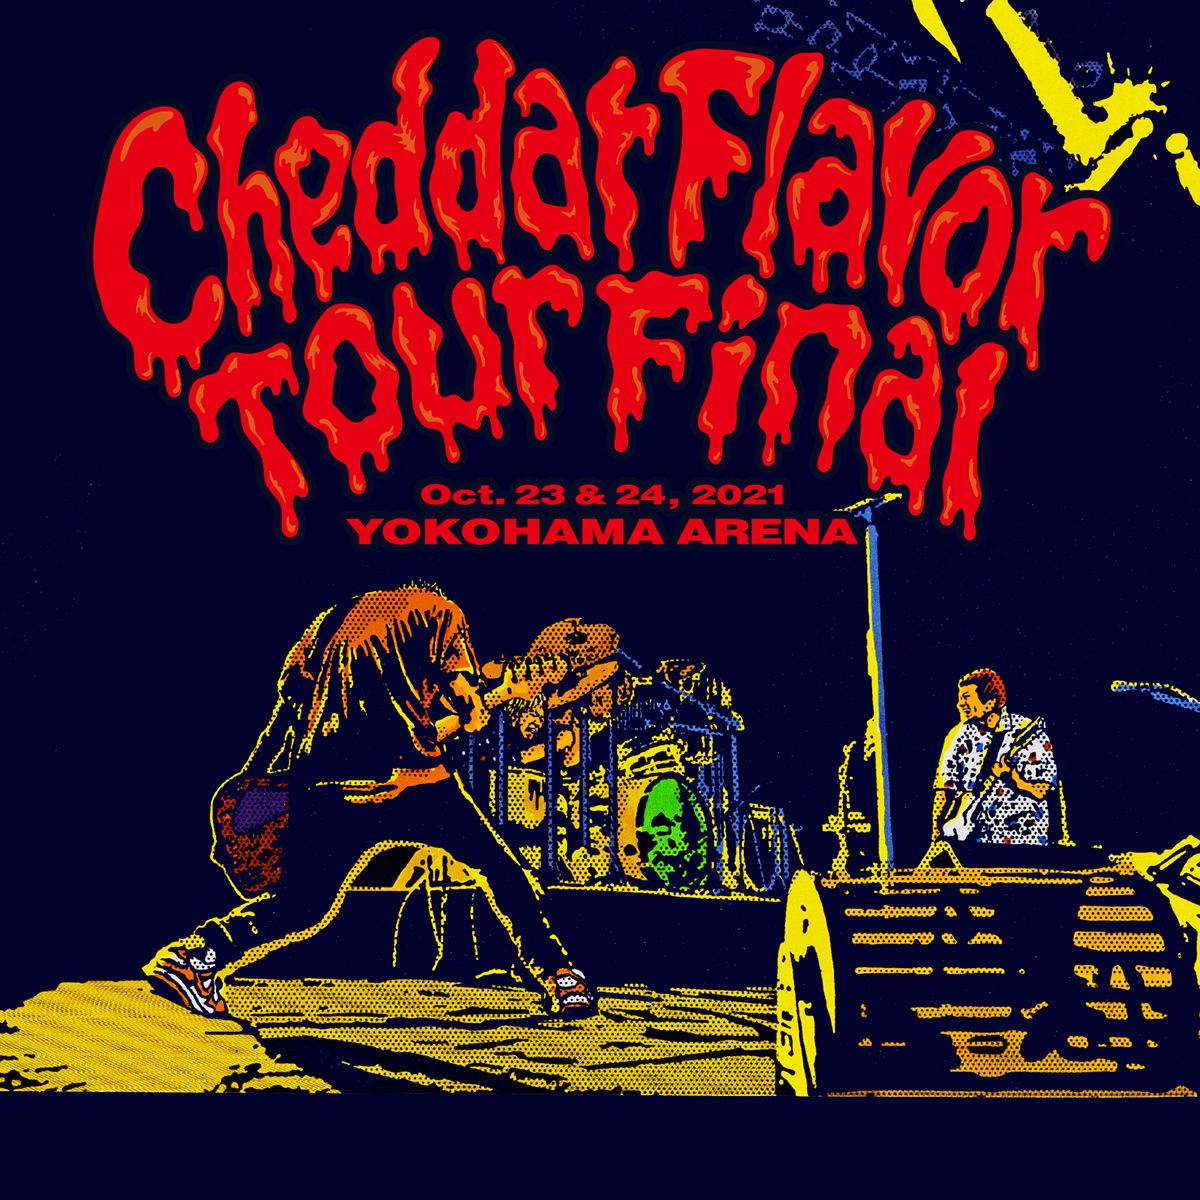 Cheddar flavor Tour Final